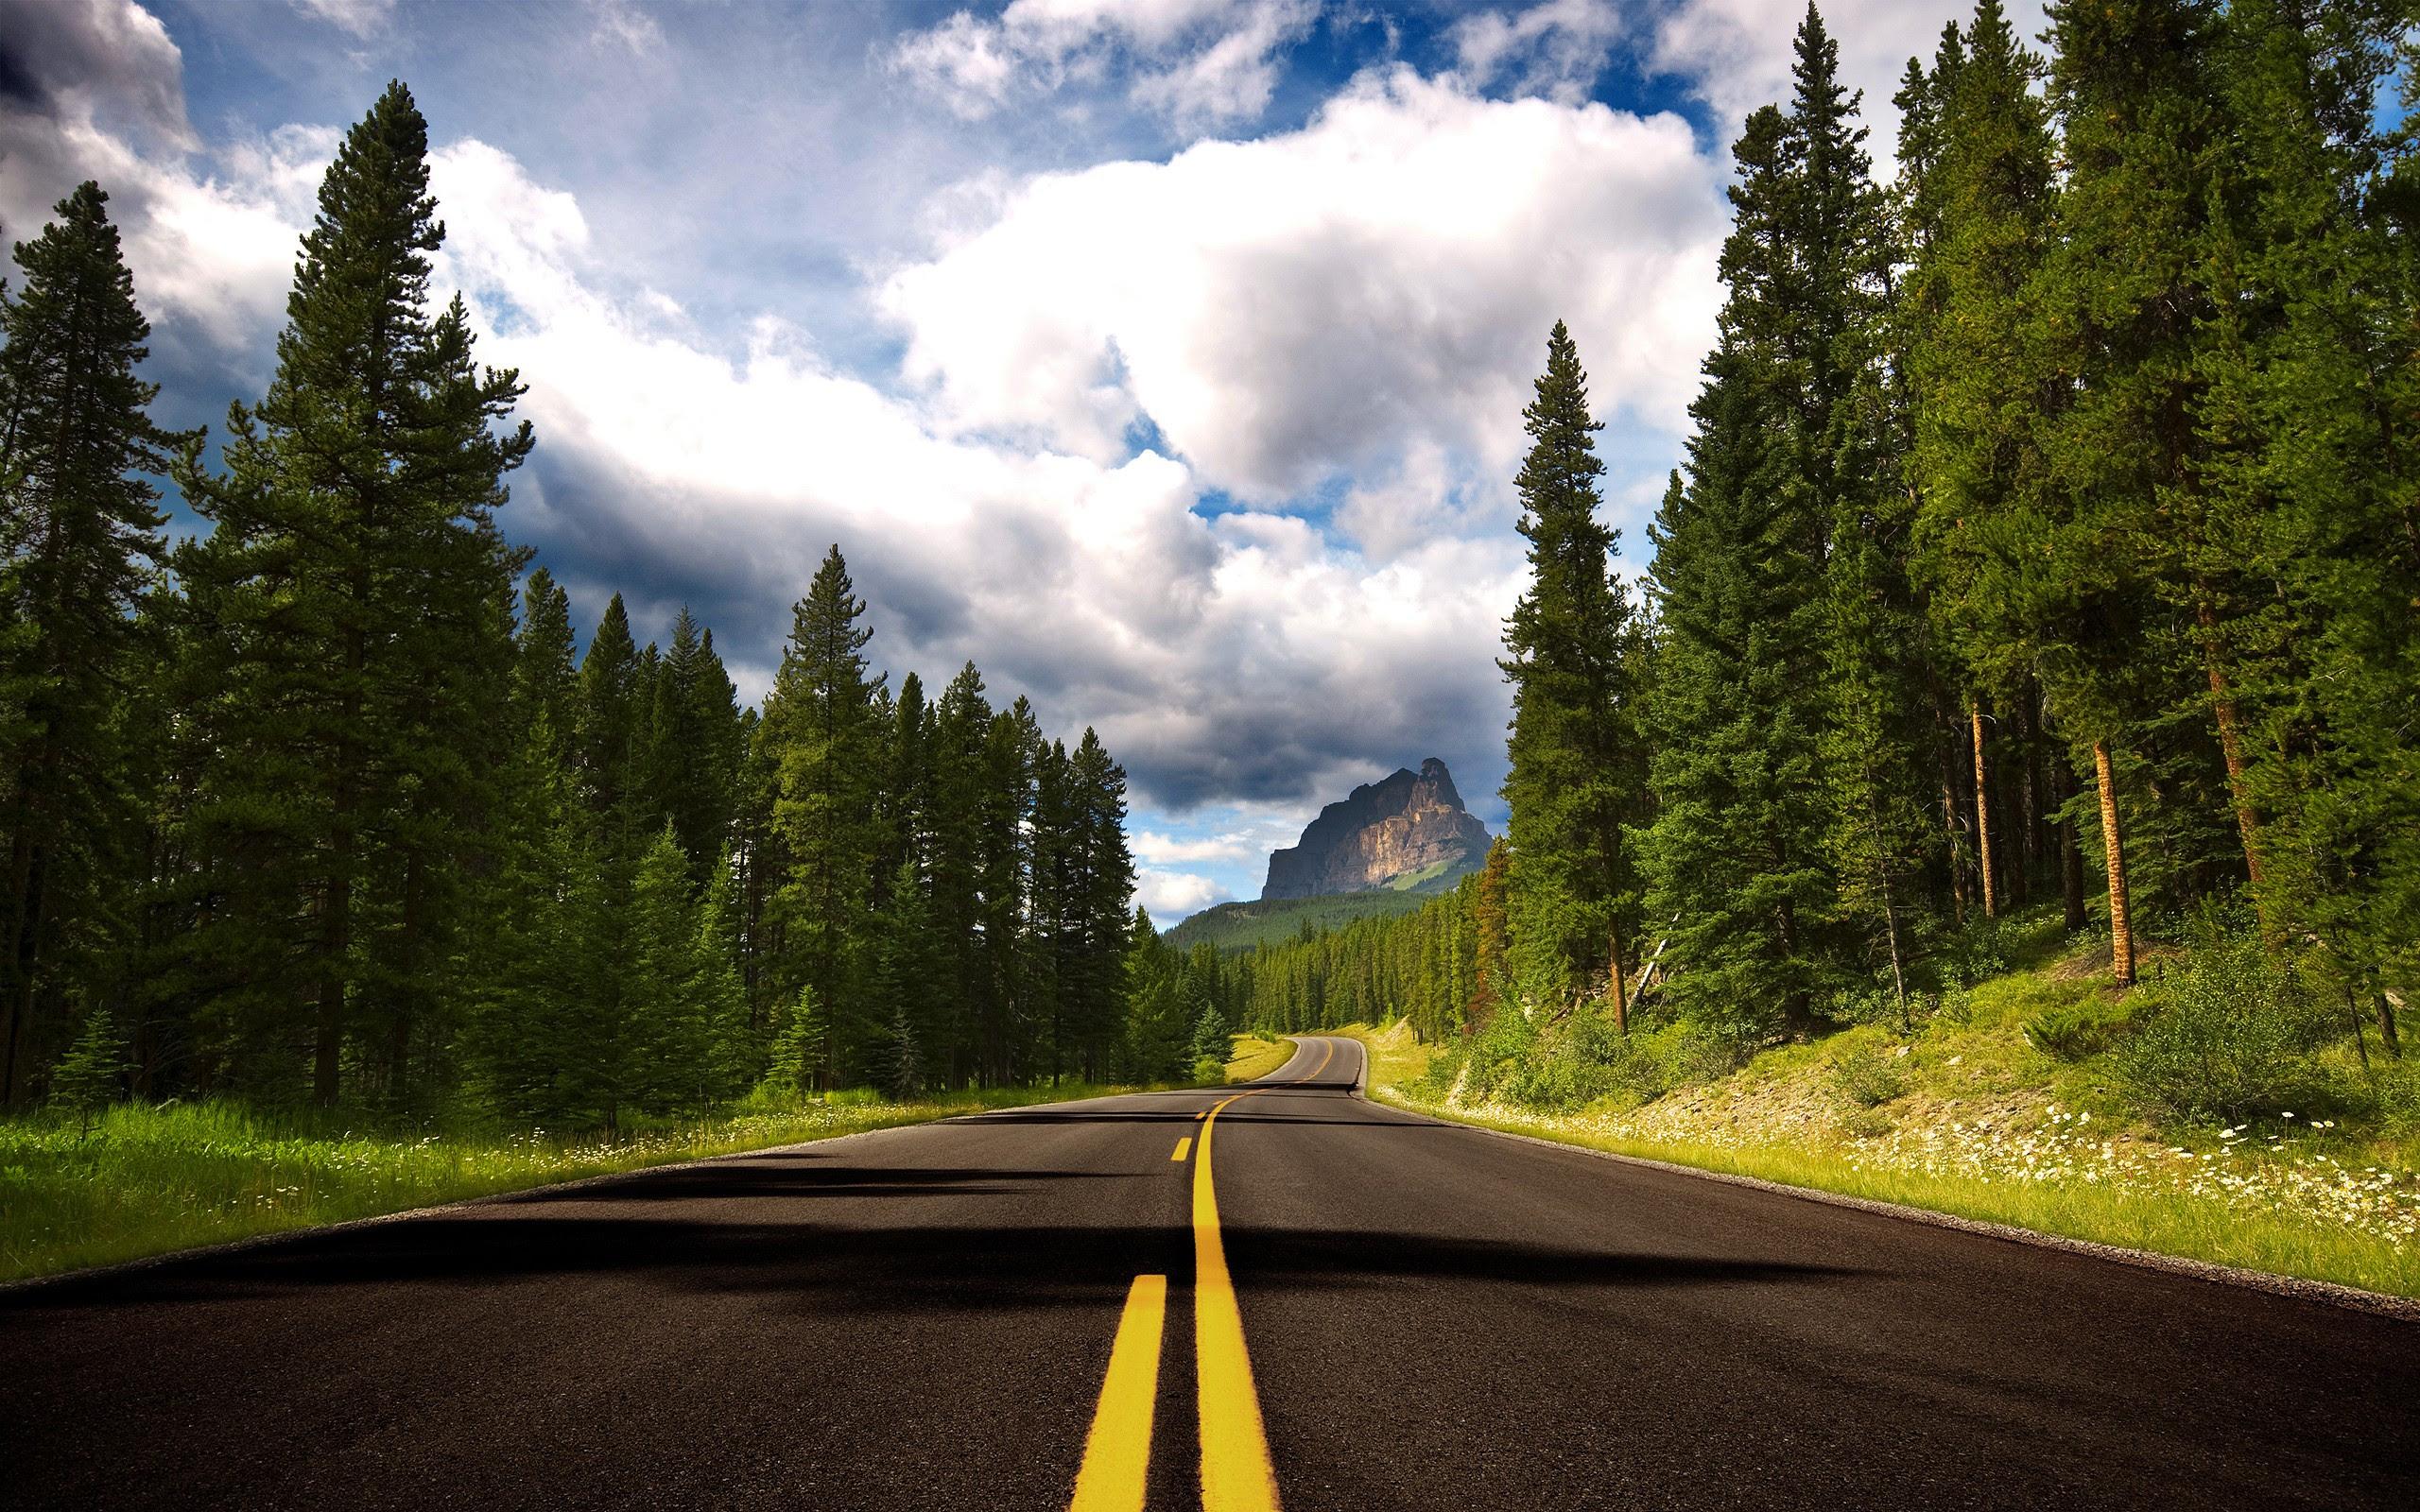 Baru 30++ Background Pemandangan Jalan - Pemandangan Top Banget